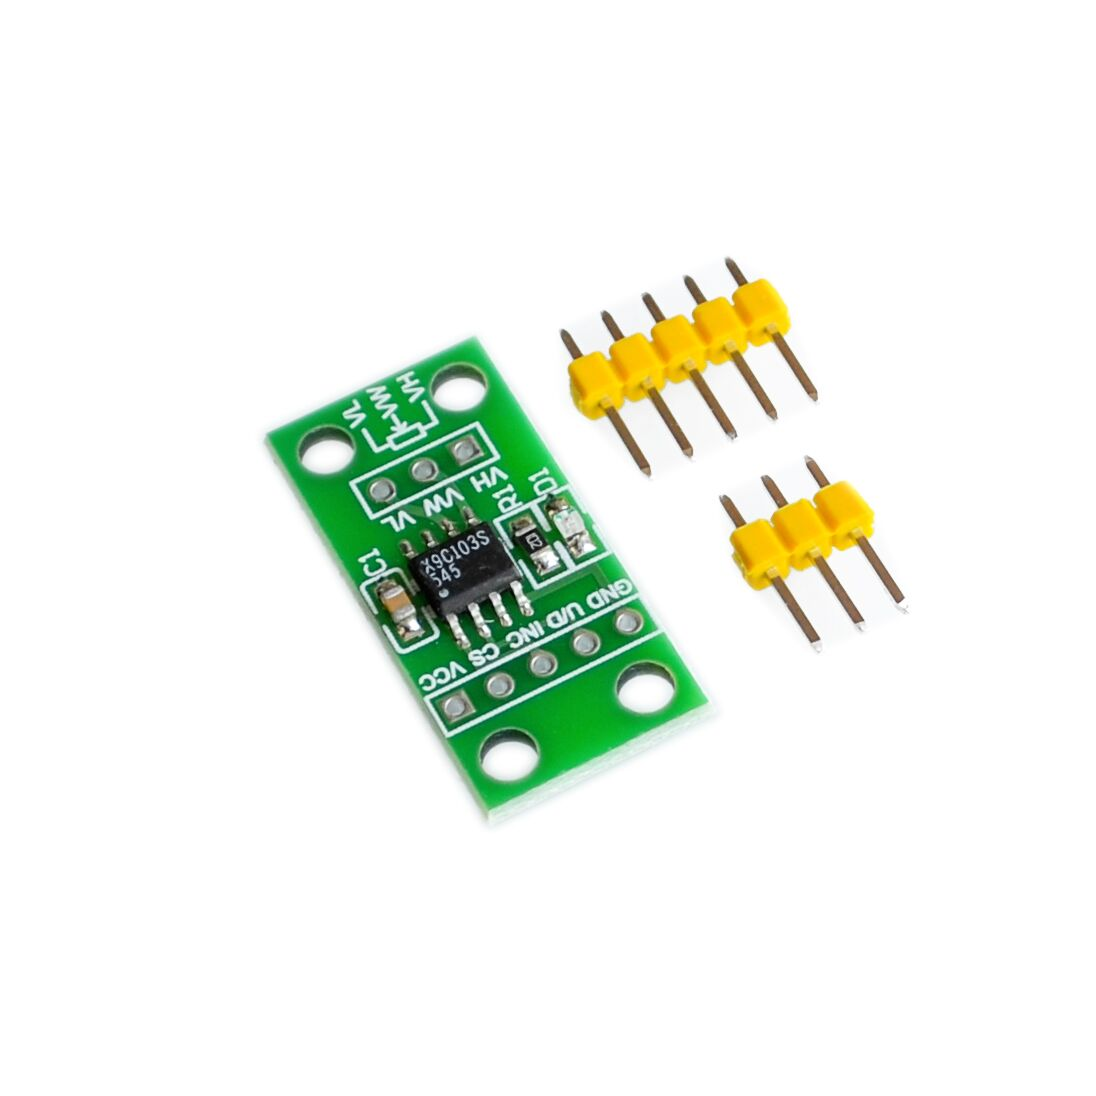 10pcs Lot 1610 1610a 1610a1 36pins For Iphone 5s 5c U2 Usb Charging Ic 6g 6p 1610a2 X9c103s Digital Potentiometer Board Module Dc3v 5v Arduino